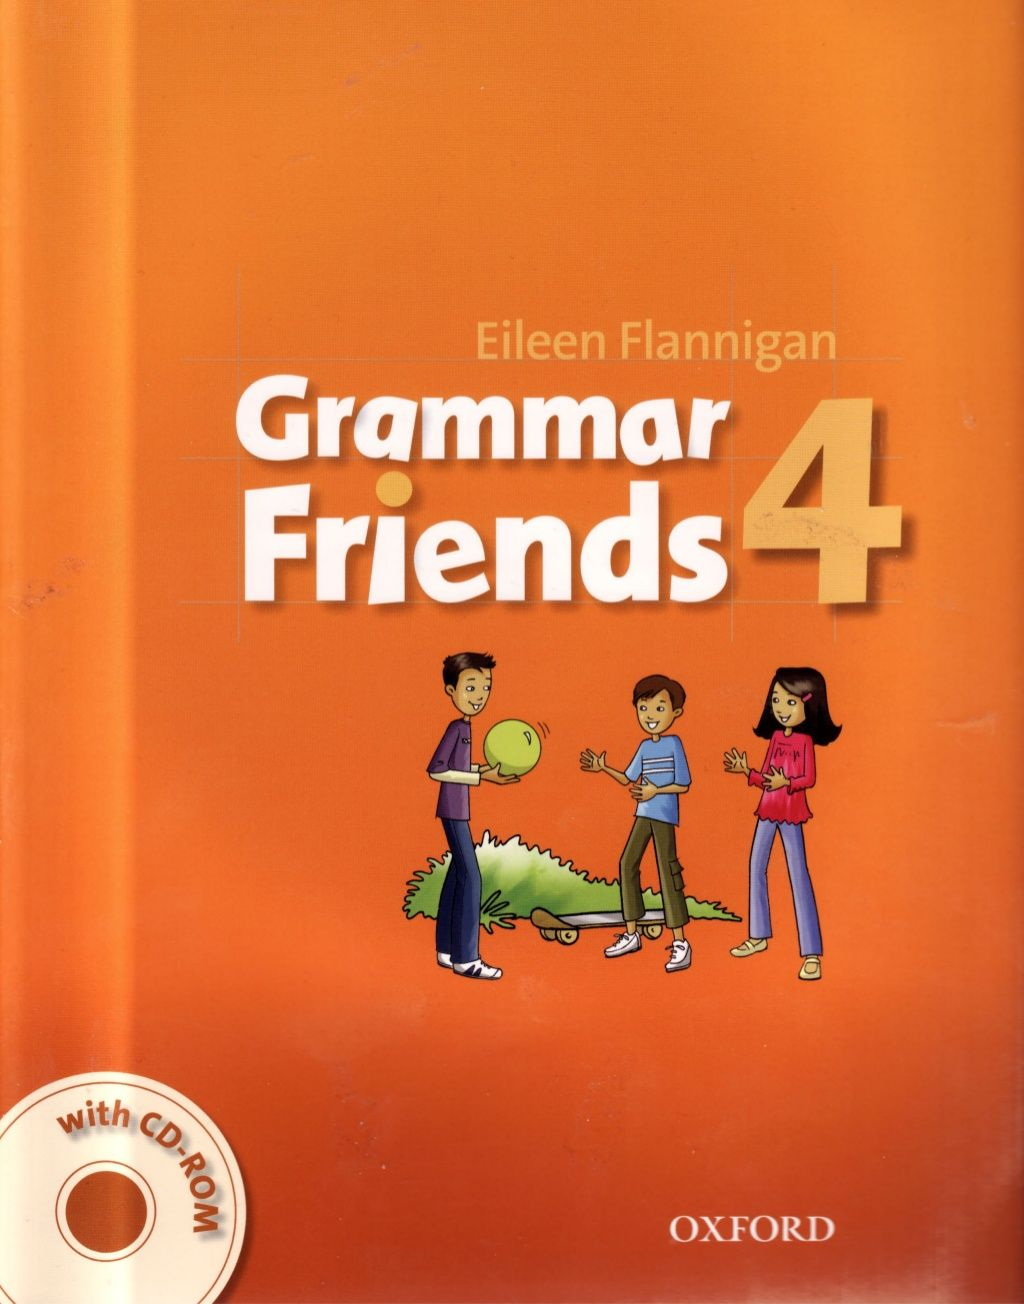 Oxford 2010 grammar.friends.jpr504.04_sb_82p by Mik2014 via slideshare